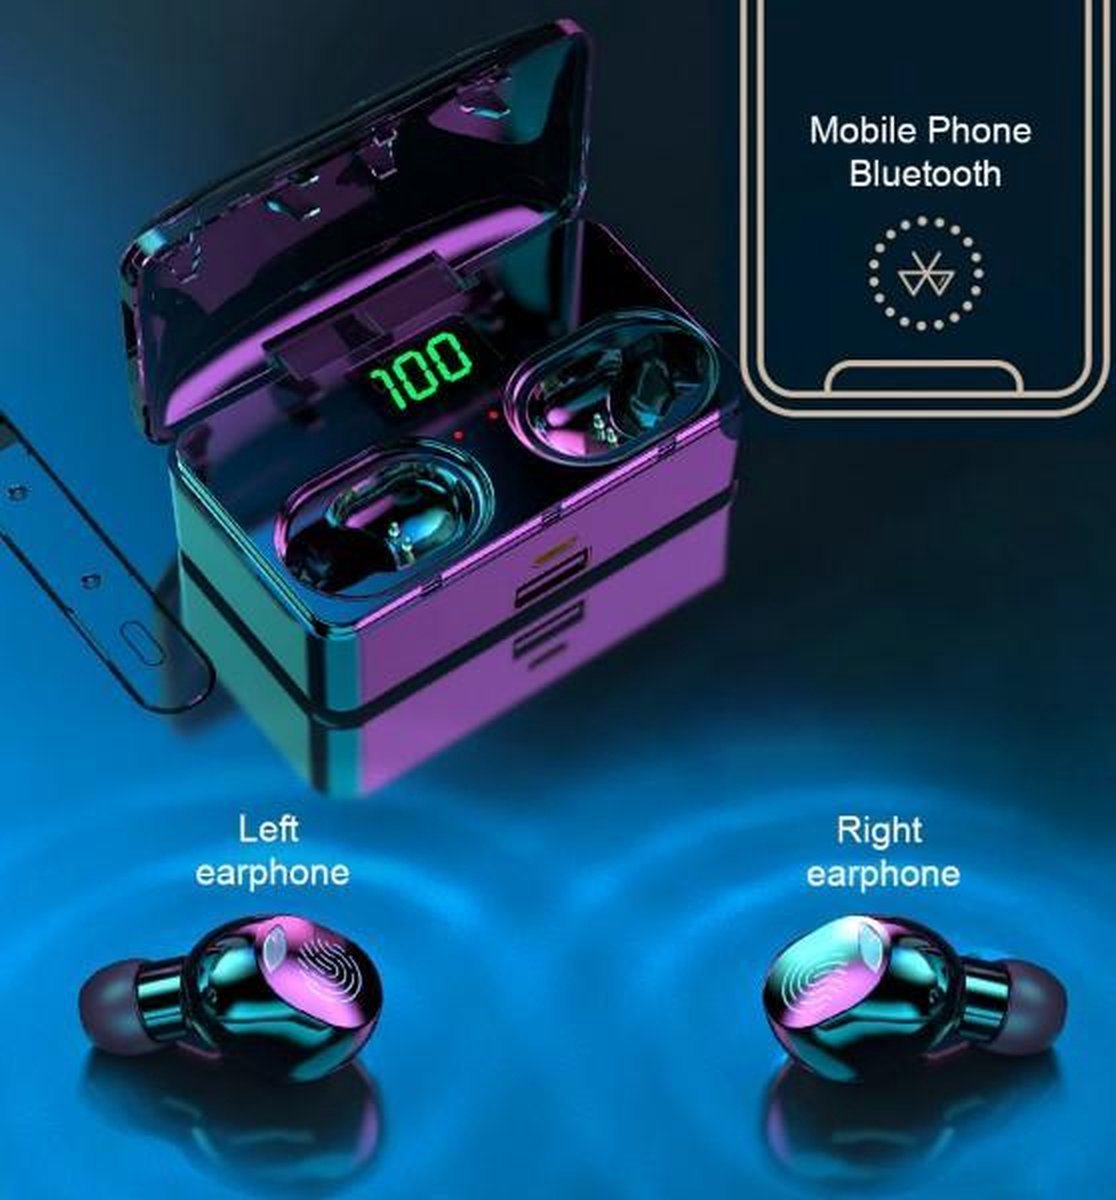 Hoco – Draadloos oordopjes 9D Stereo Sports – Bluetooth 5.1 koptelefoon/ Draadloze sport oortjes/ sportoordopjes/ Oplaadcase – Power bank /Bluetooth Oordopjes/Compatibel  iPhone, Samsung, Huawei, Android-smartphones enz. – In-ear – Headphone -Headset